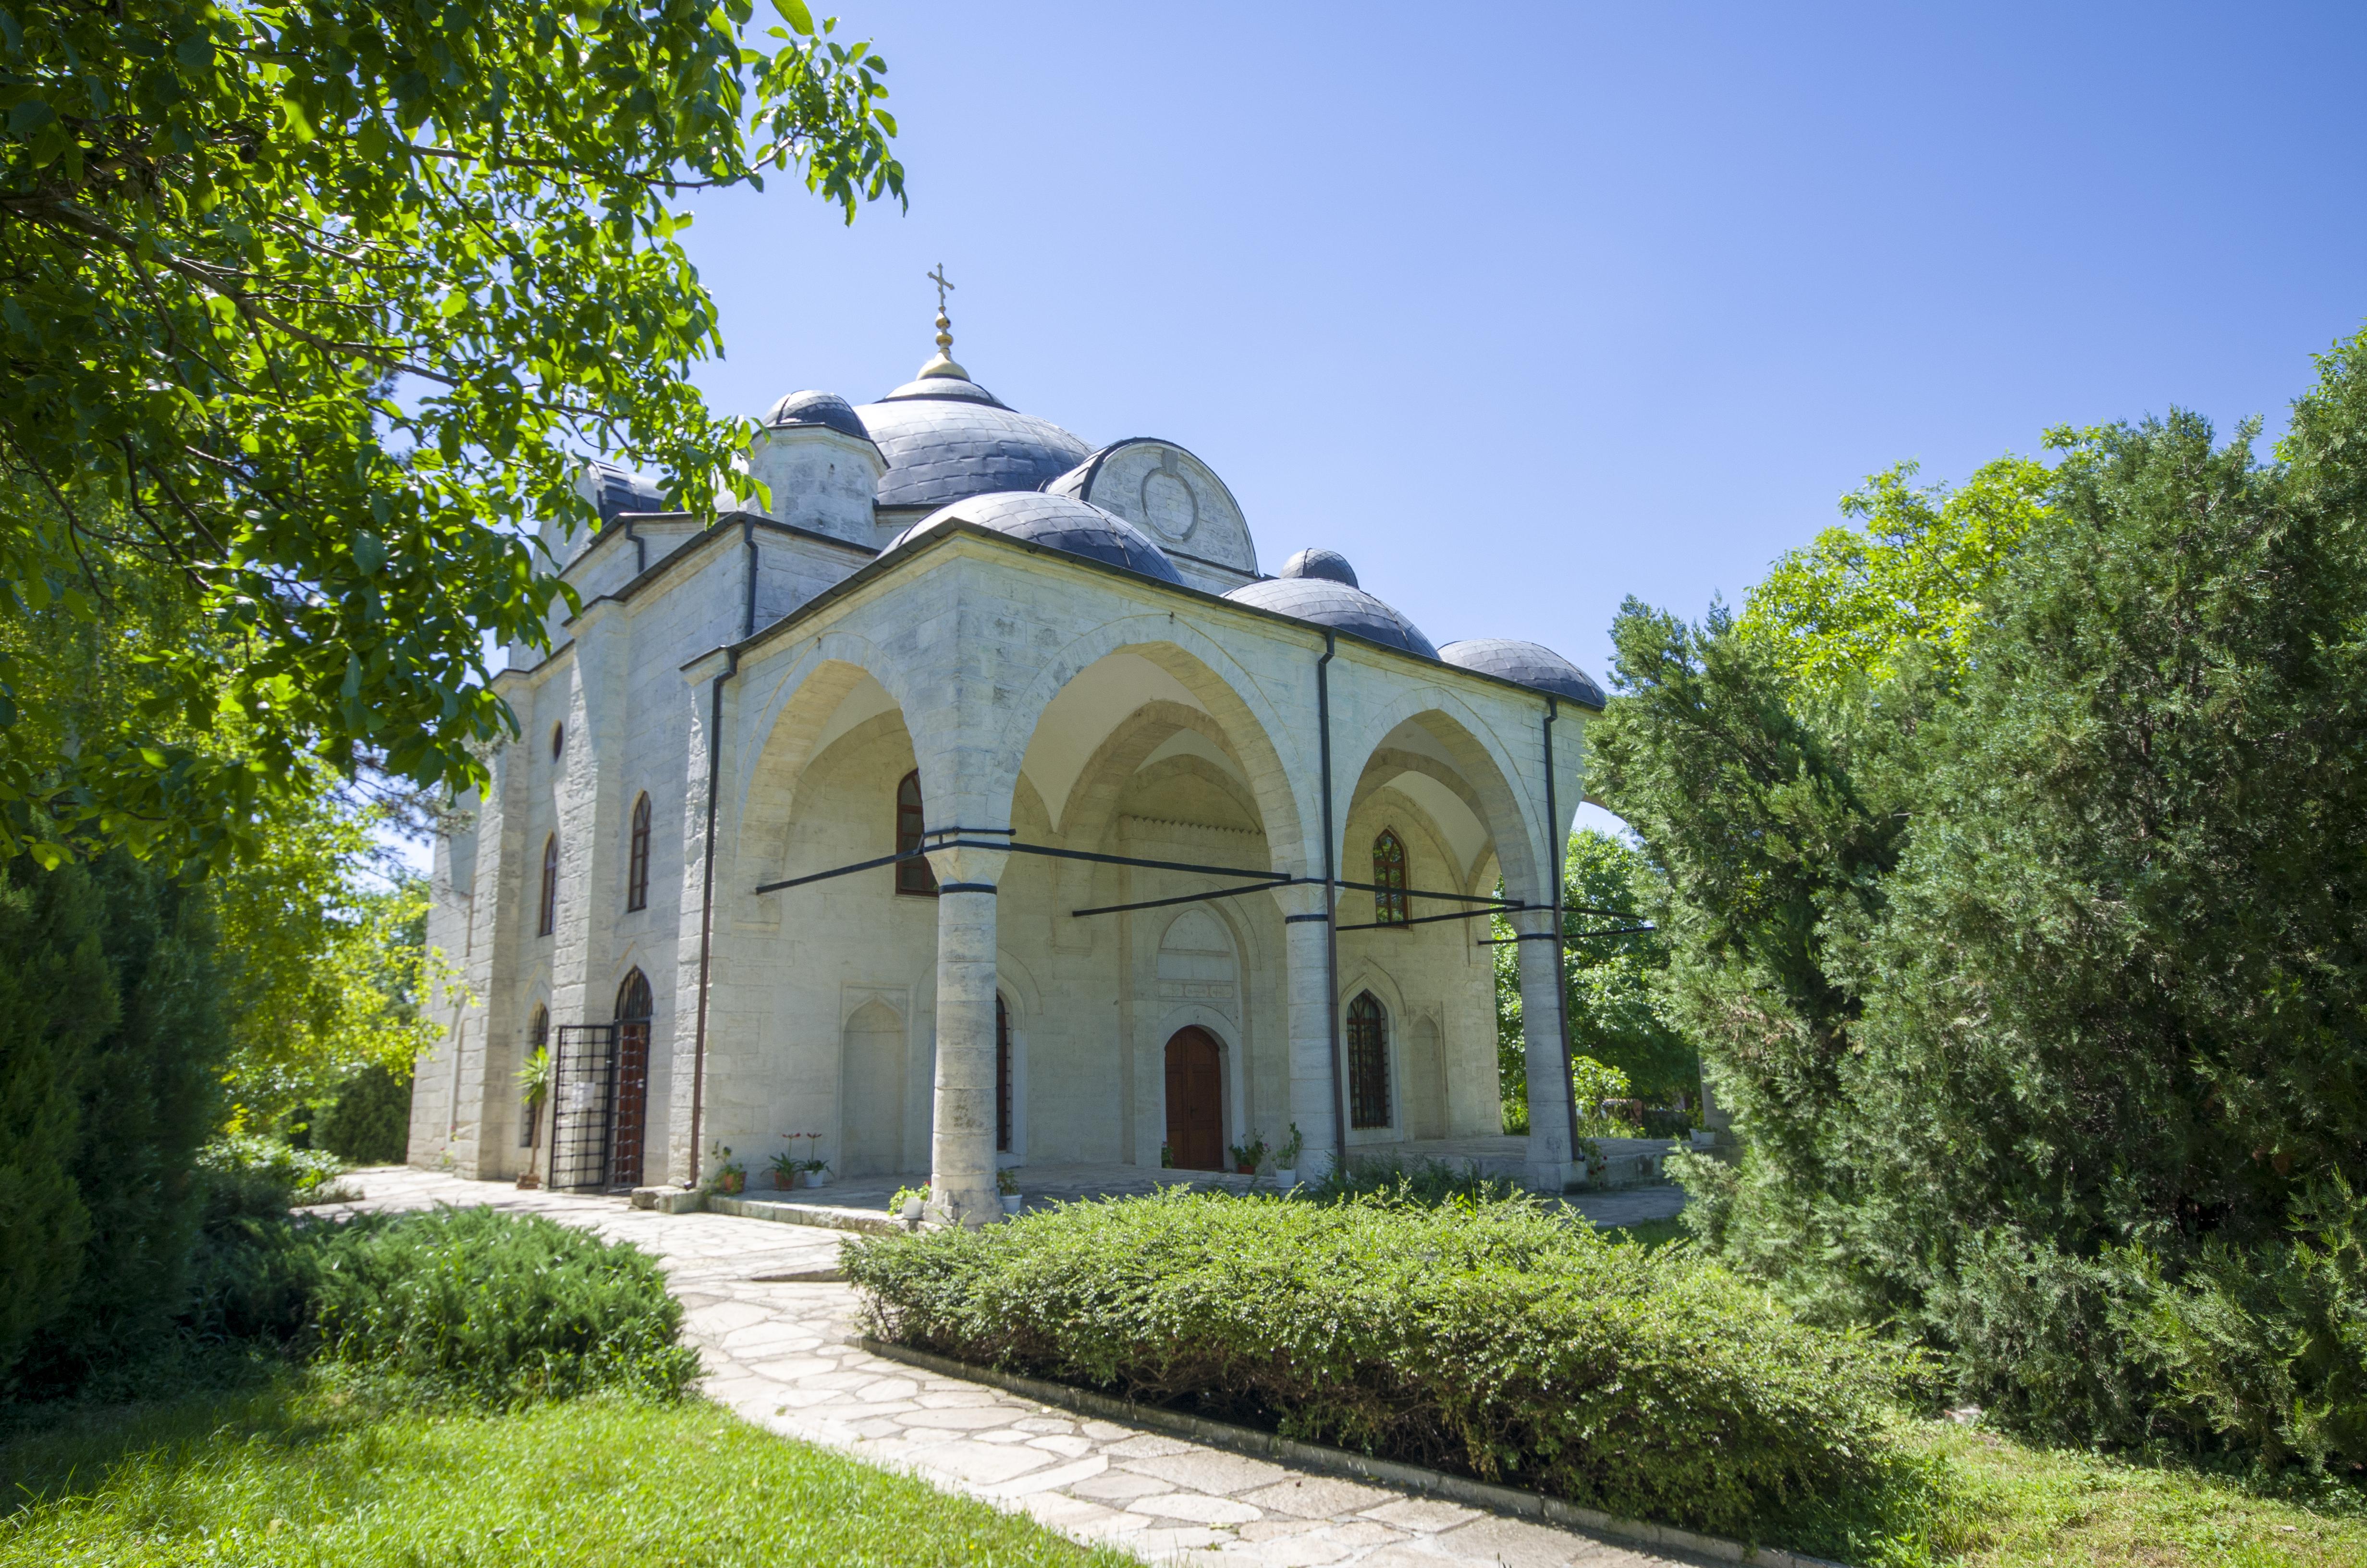 Bulgarien: Fatihi Gazi Sinan Paşa Moschee ist nun eine Kirche